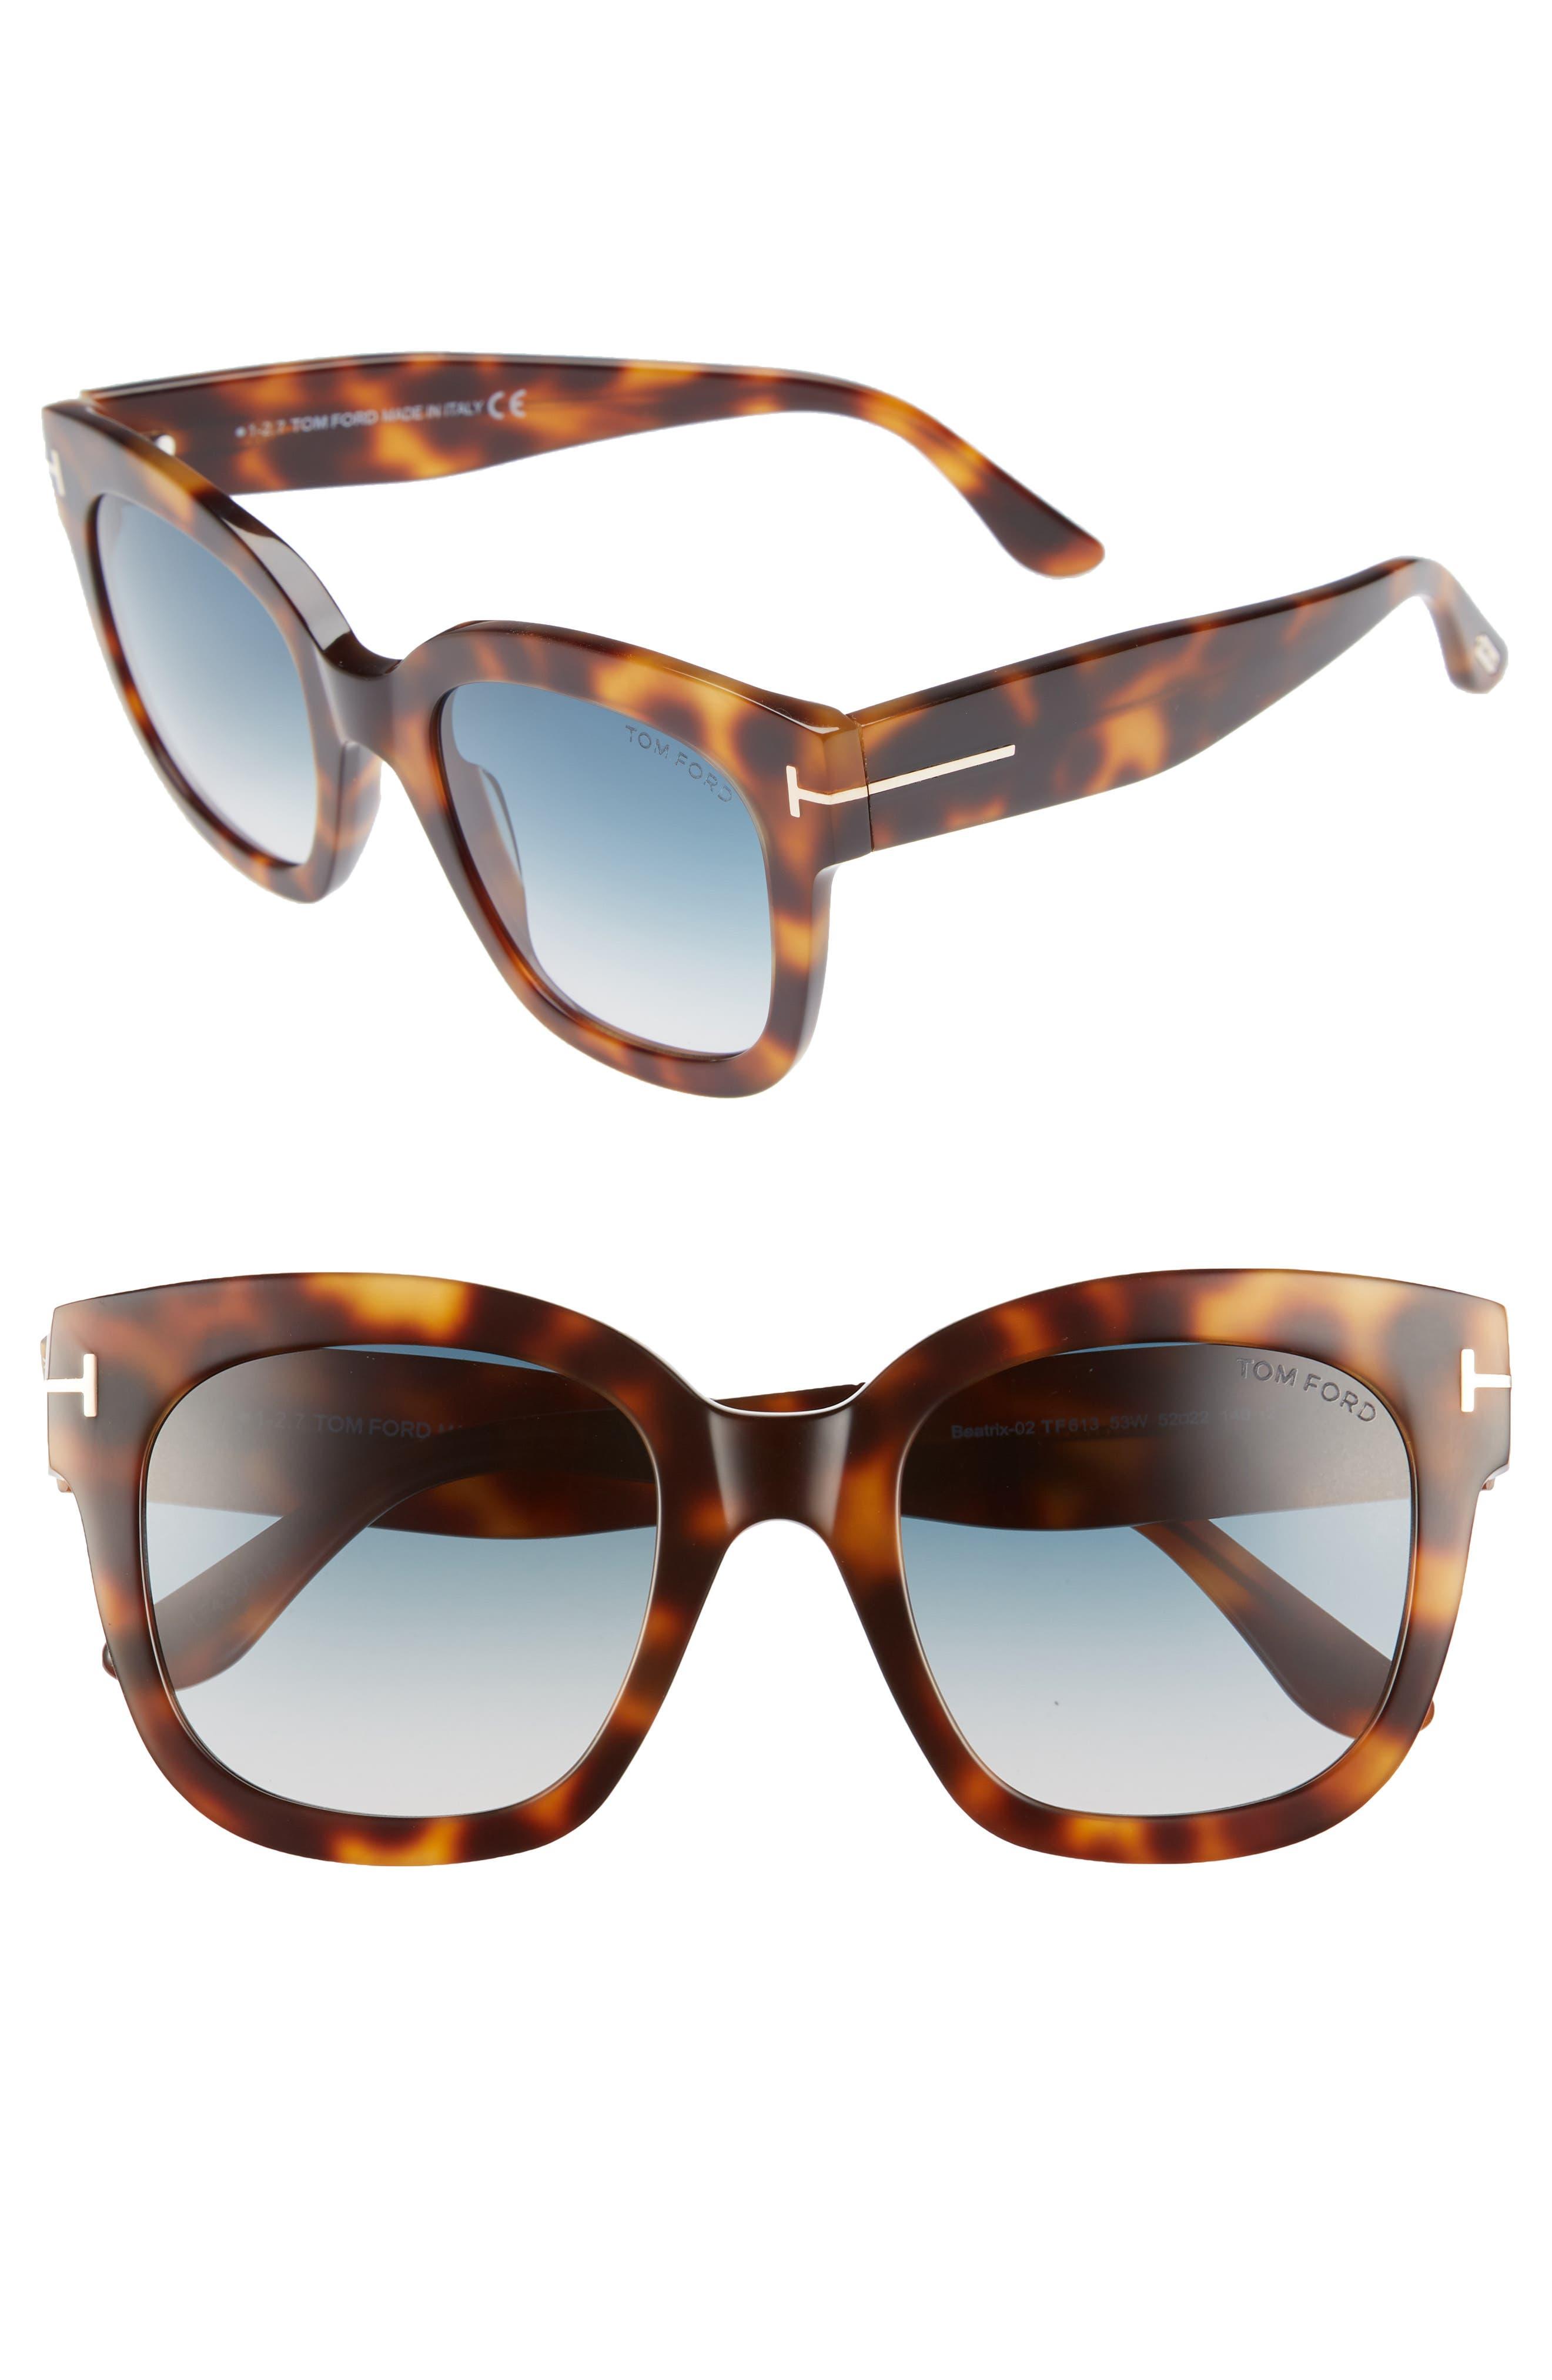 2b4a31e4f55 Square Tom Ford Sunglasses for Women   Men